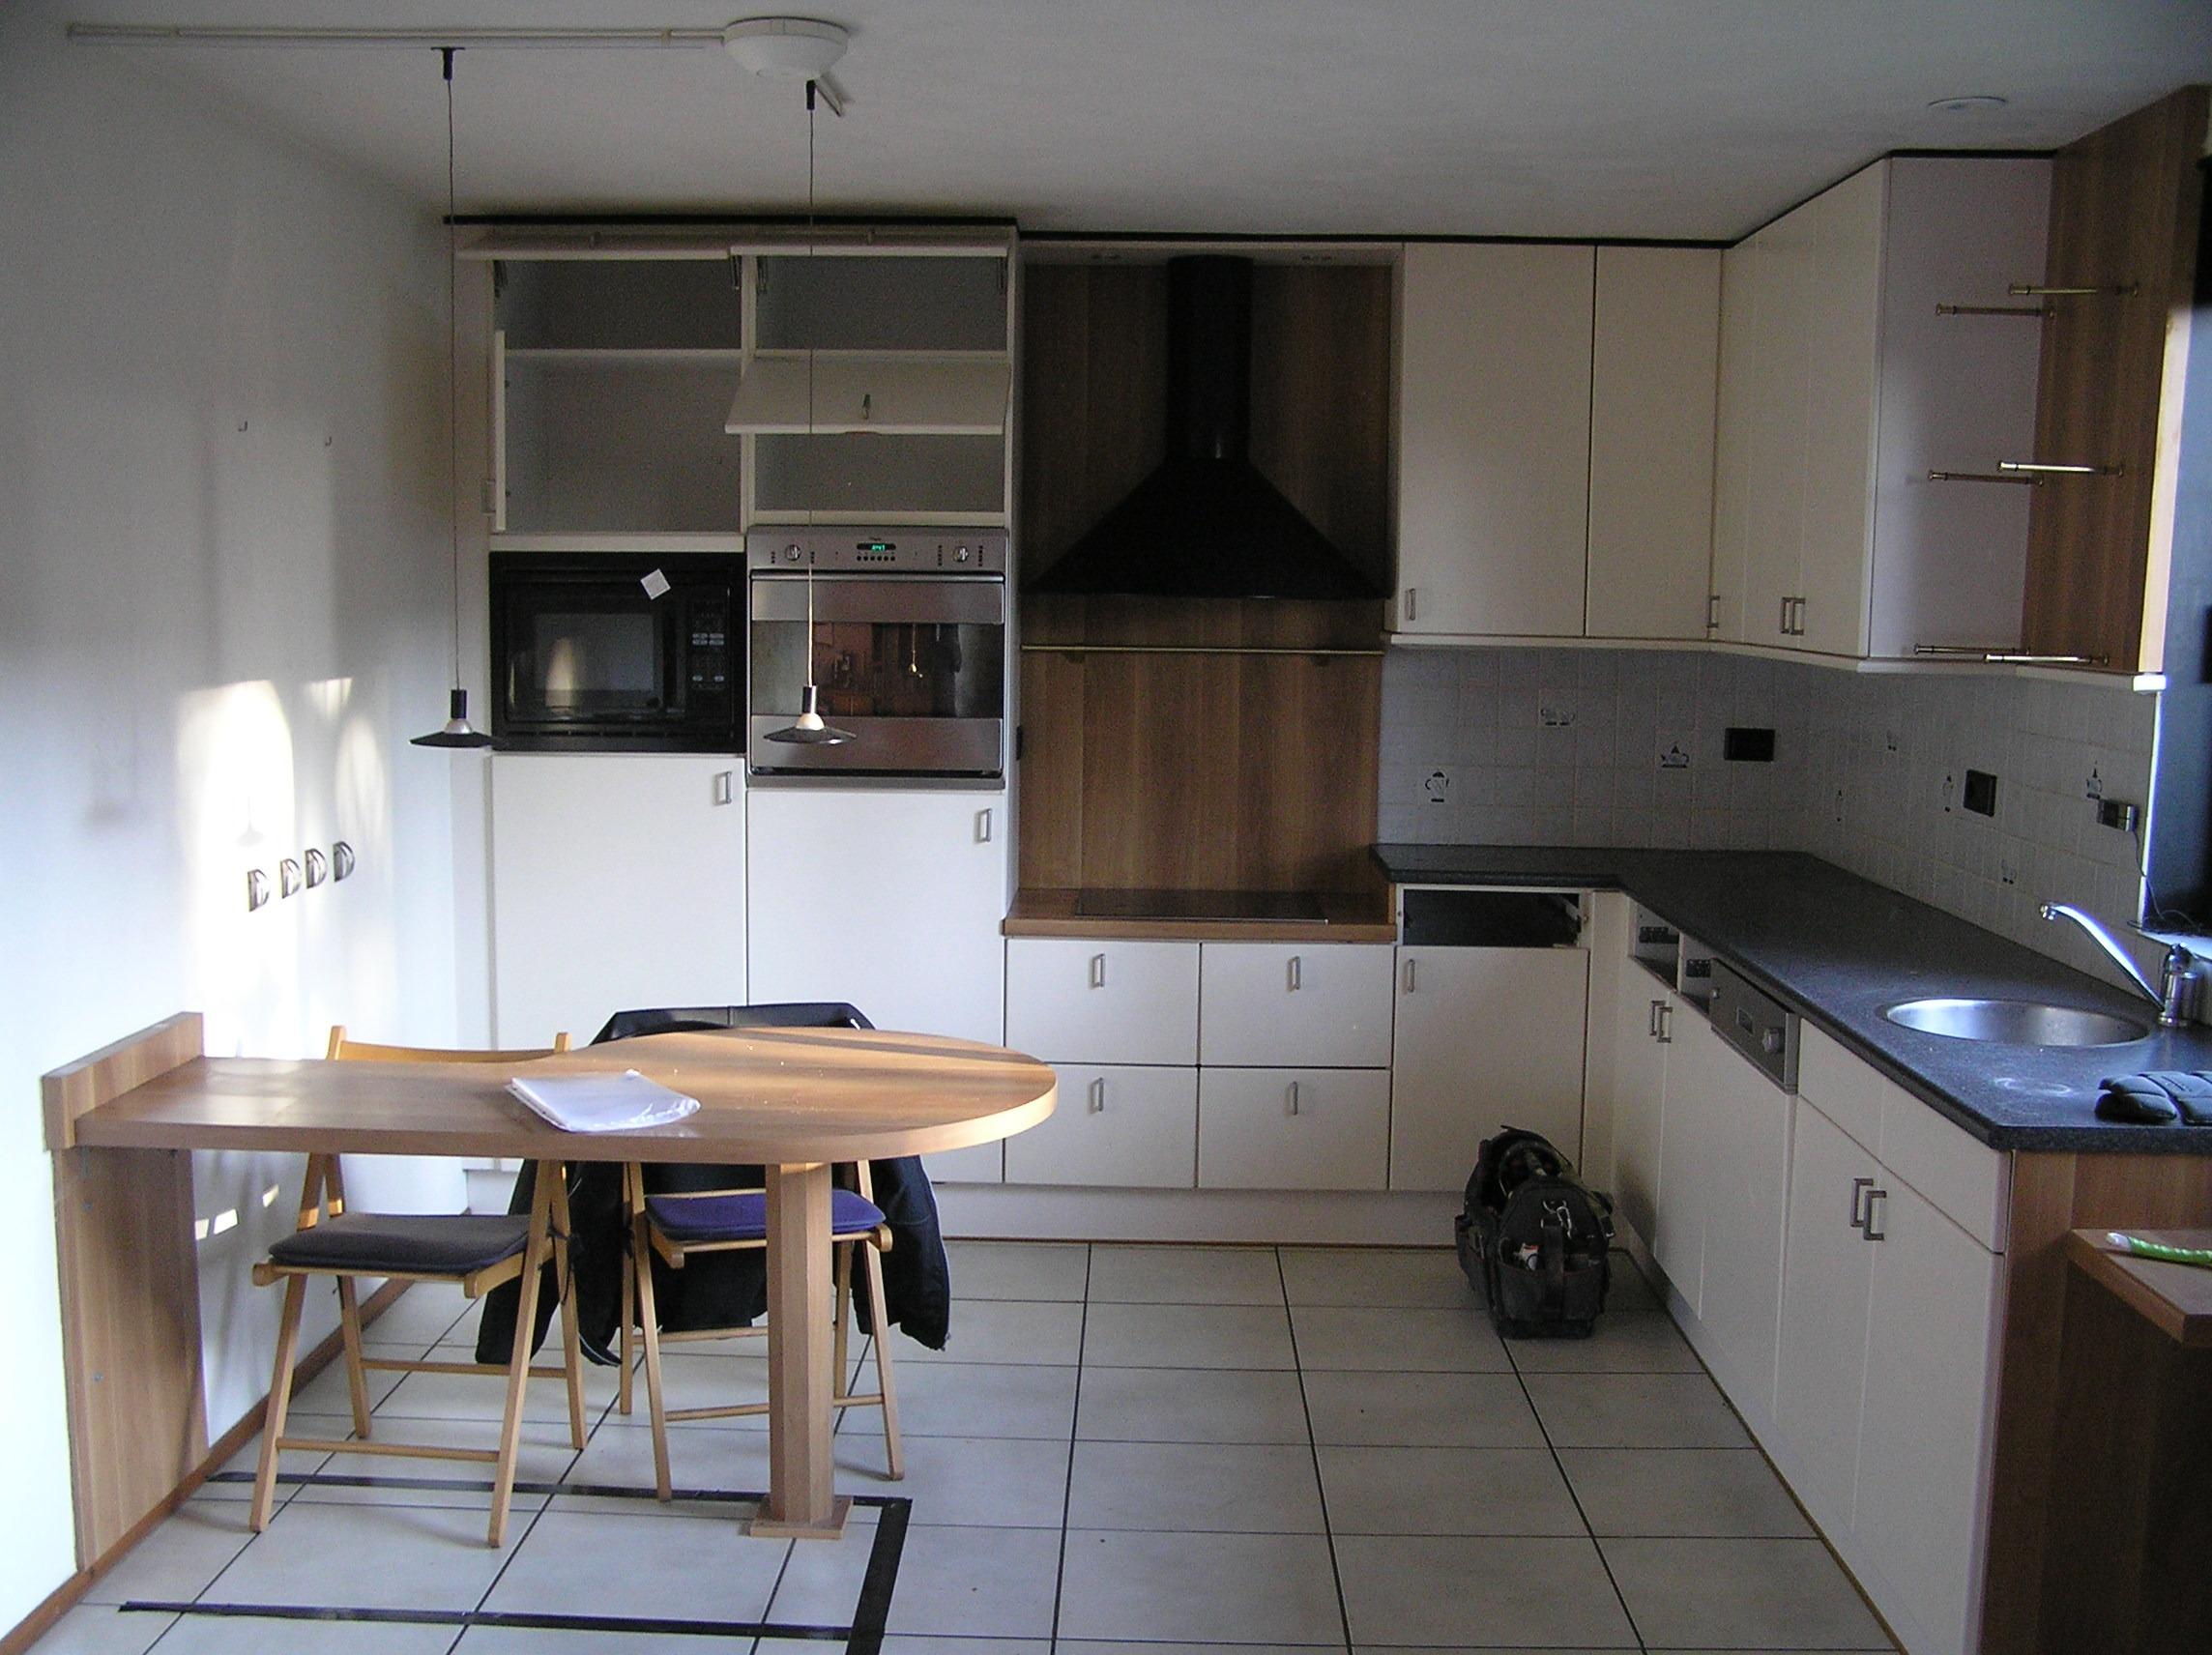 Keuken Roosendaal - Fam de Munnik – Schuurbiers - Specialist in ...